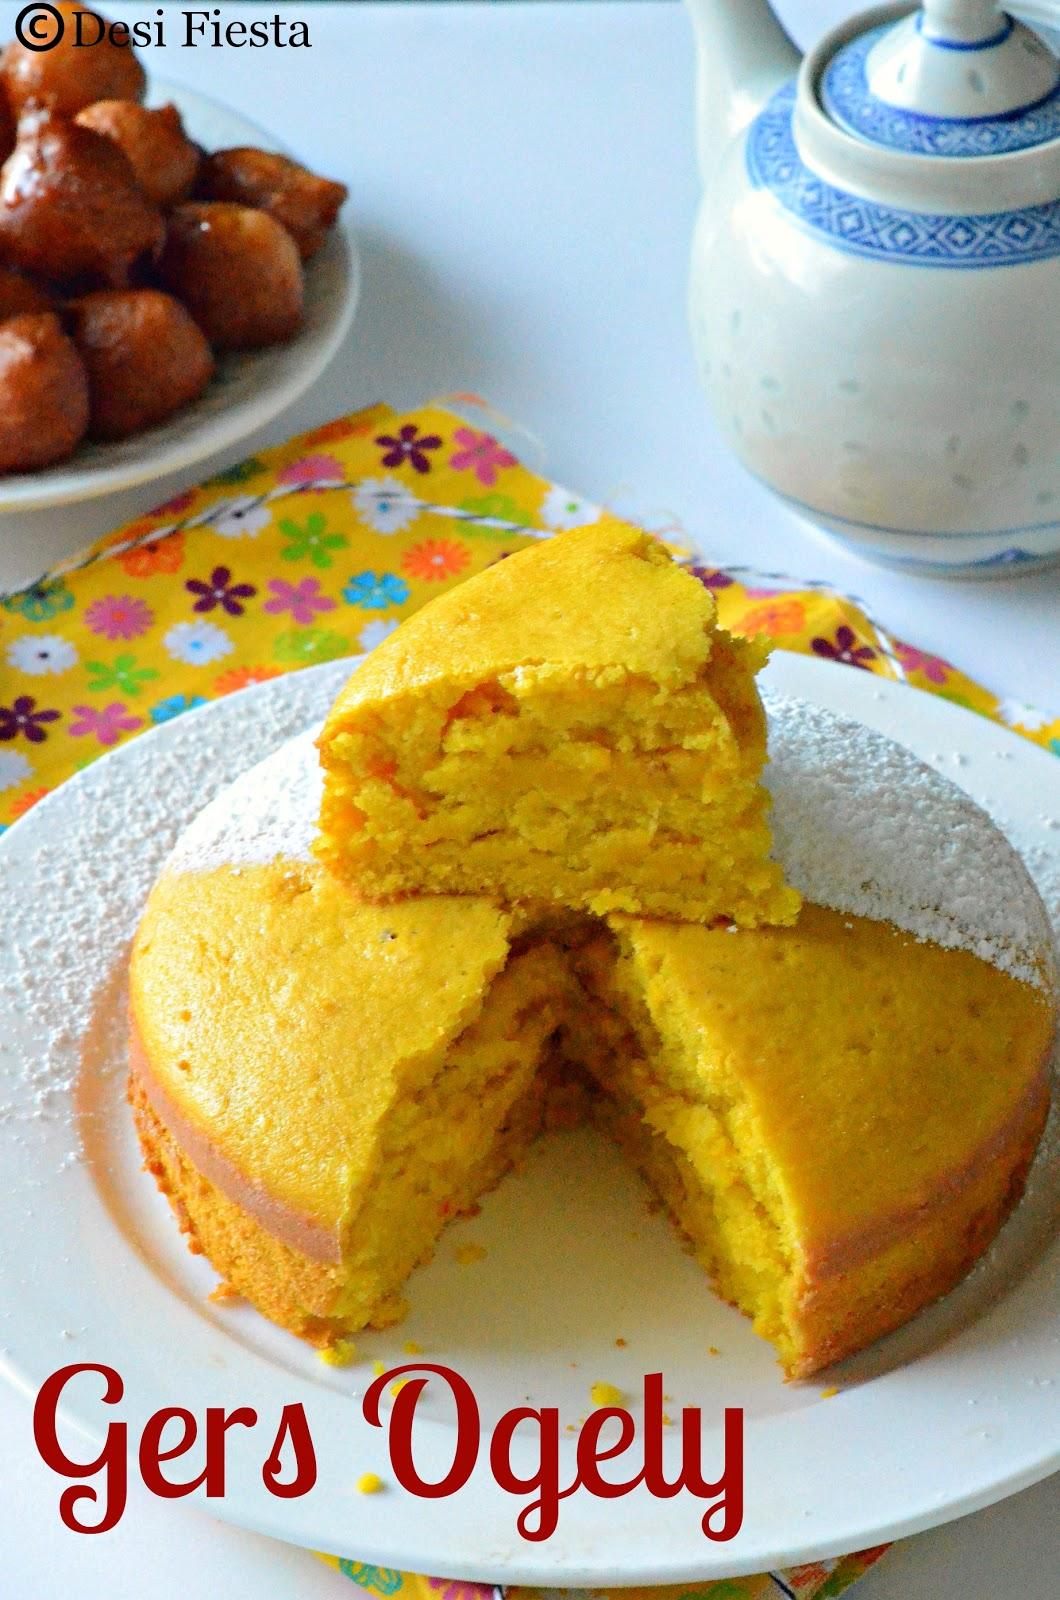 Desserts and Tea time snacks recipe